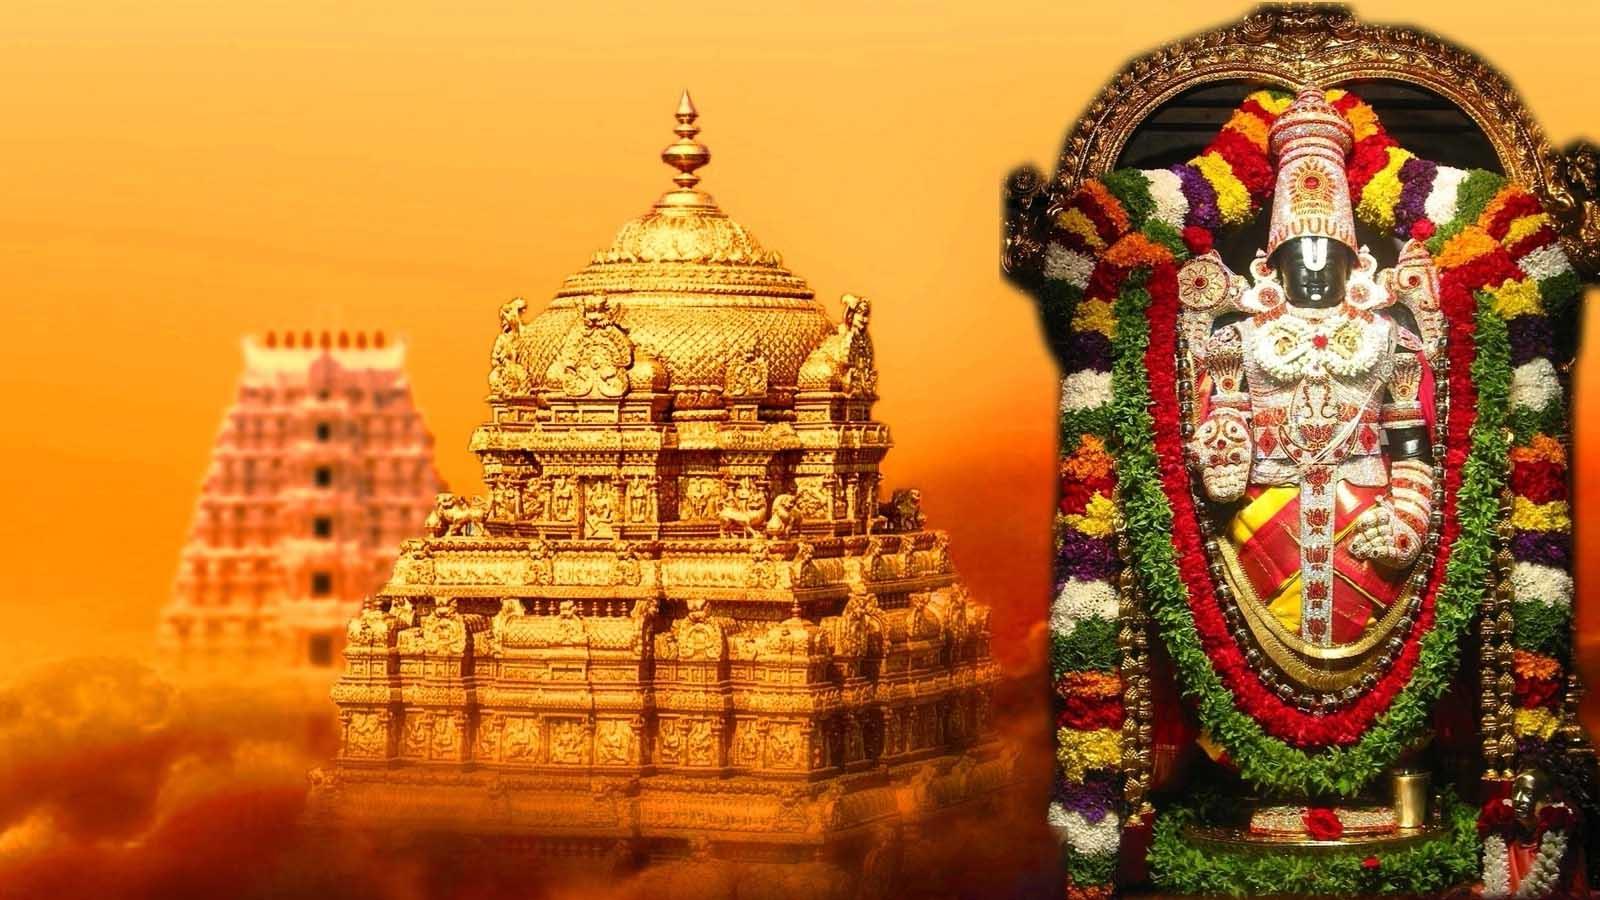 Tirumala Tirupati Venkateswara Swamy Temple - Top Ten Richest Temple